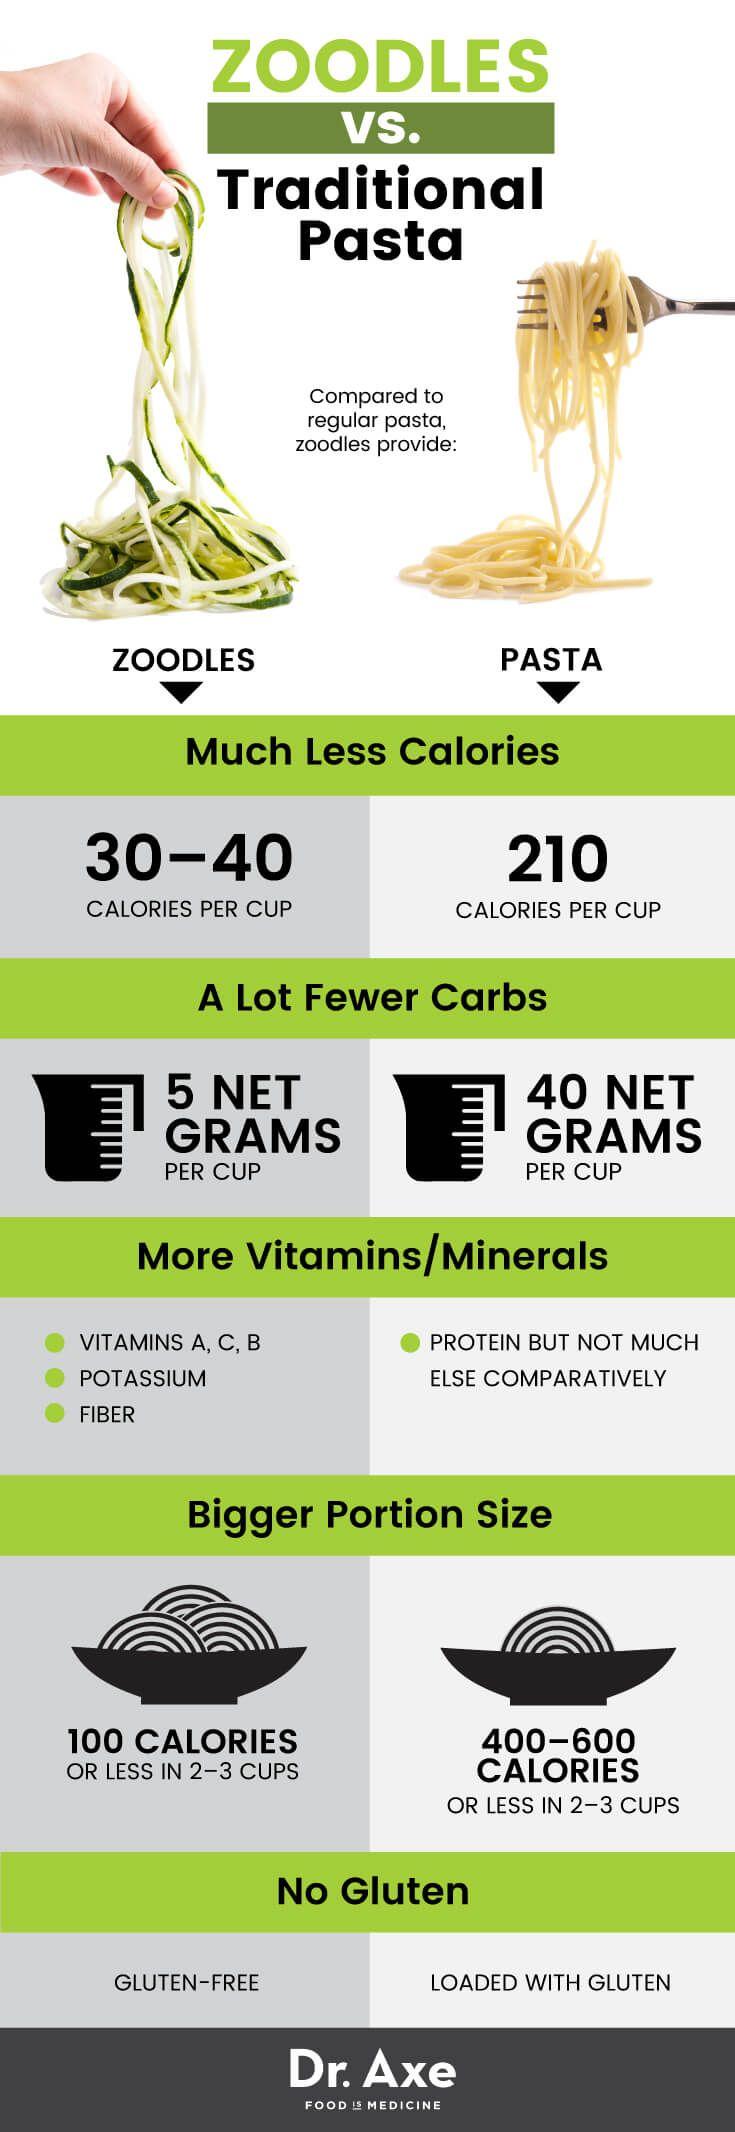 Zoodles: Top 5 Benefits of Zucchini Noodles + Zoodle Recipe Ideas